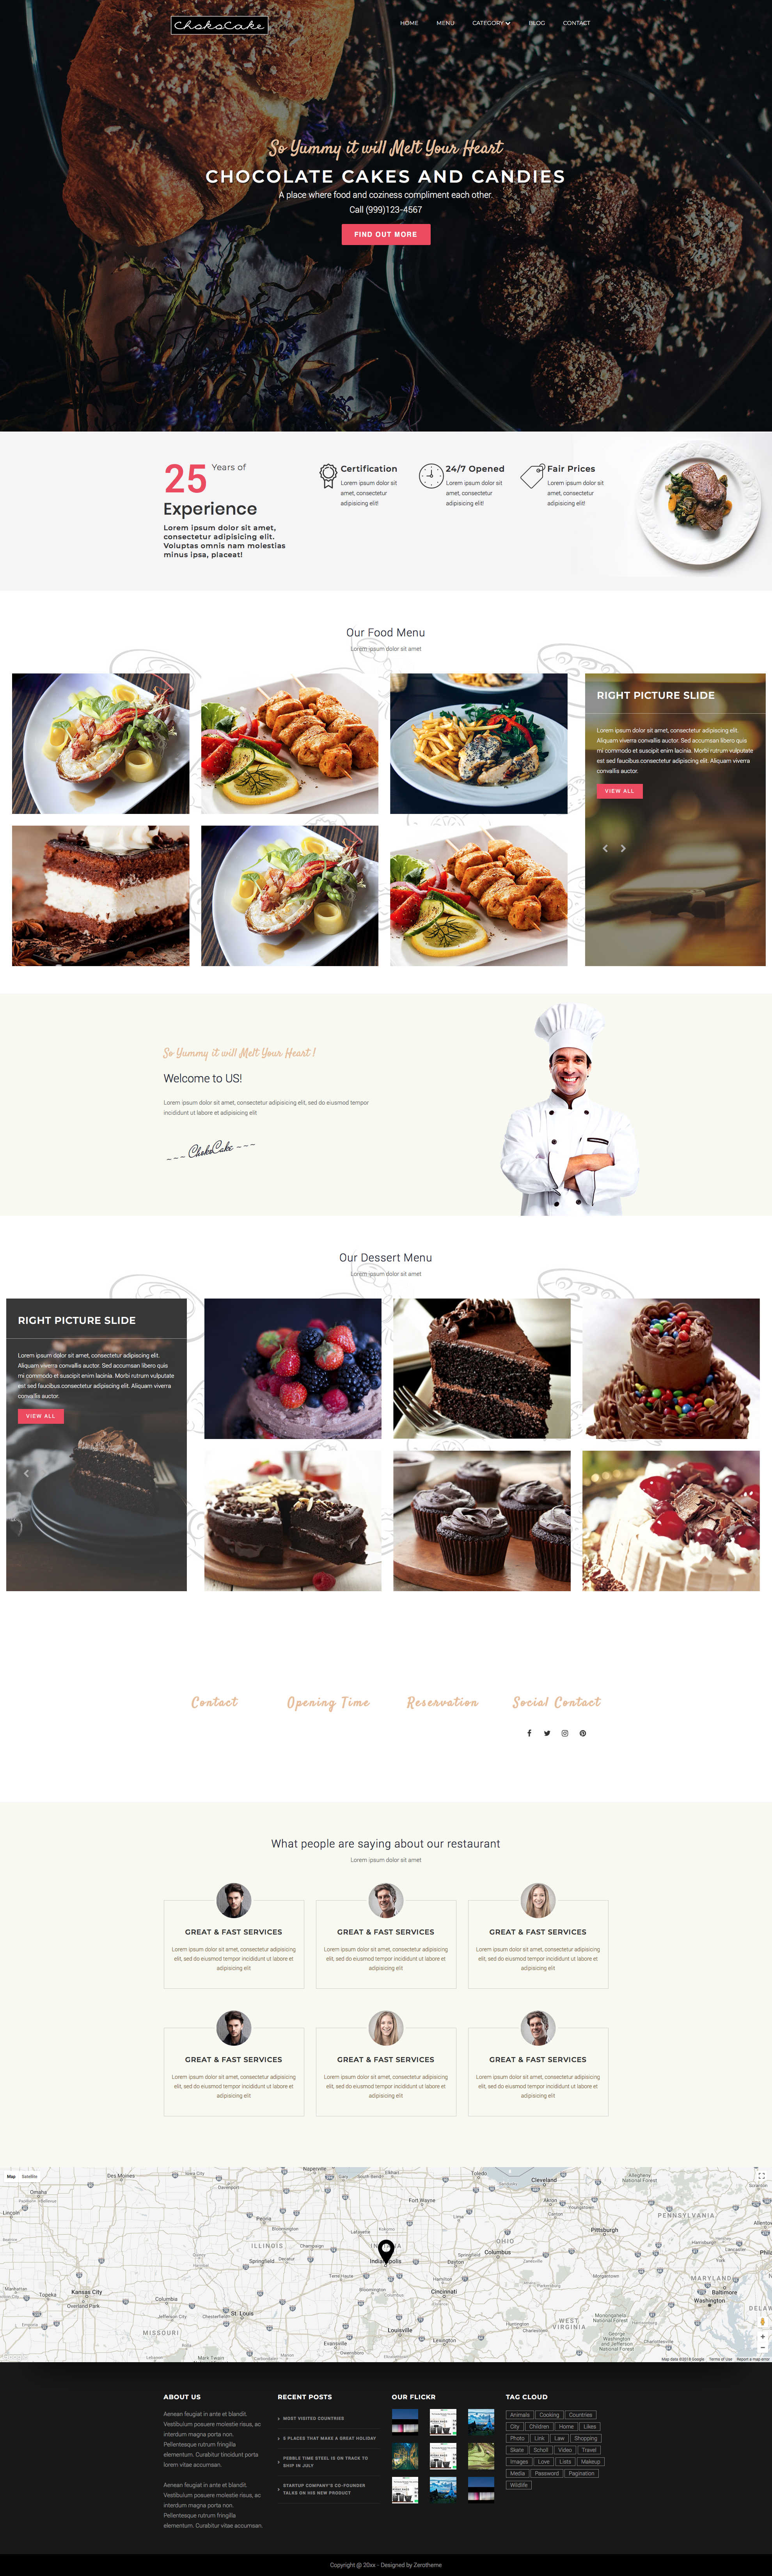 Zchococake Free Responsive Html5 Bootstrap Restaurant Template